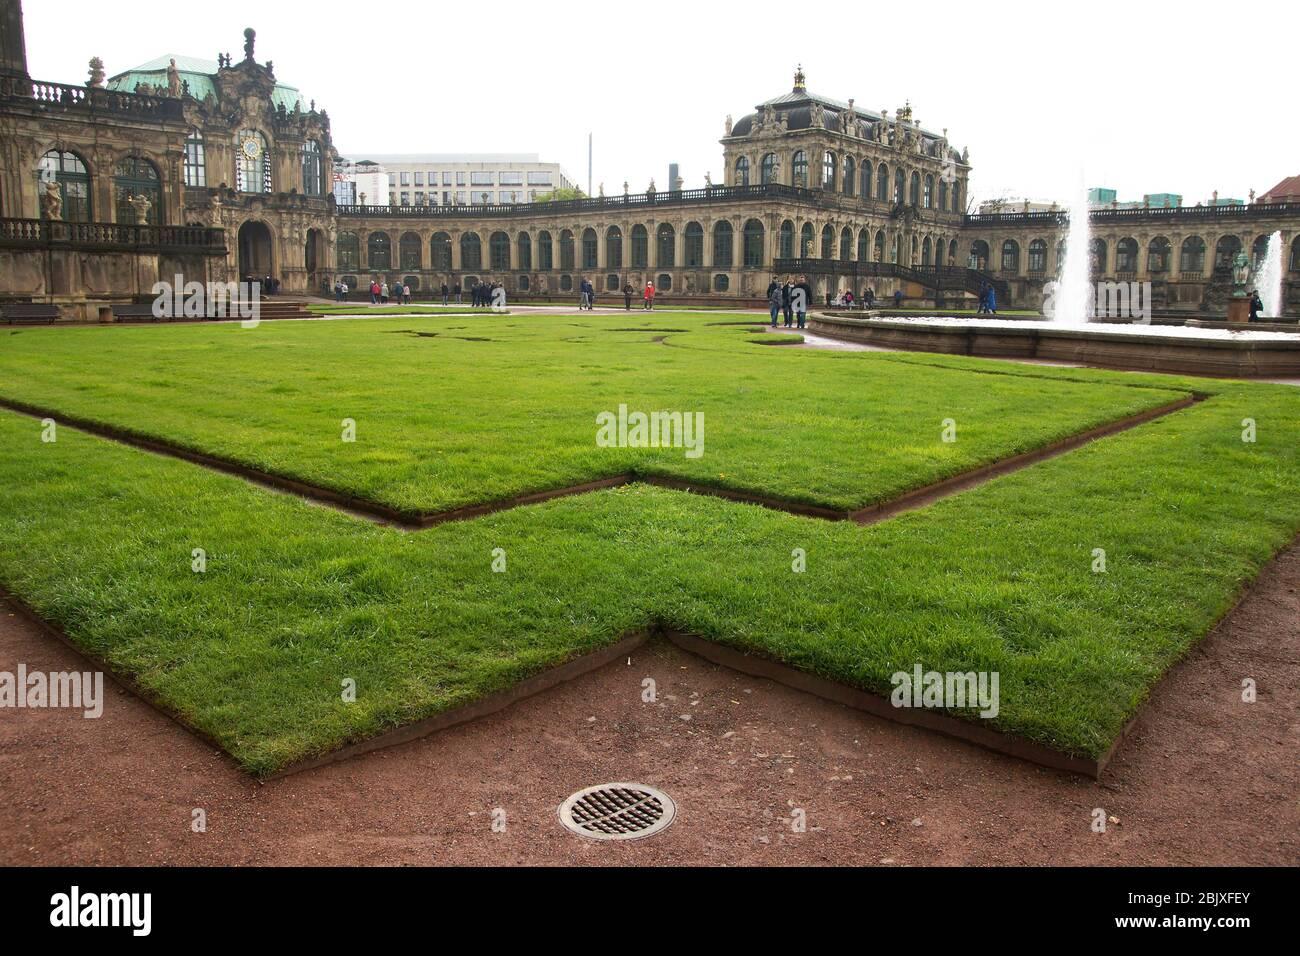 geometrische Rasen-Anlagen im Dresdener Zwinger Stock Photo